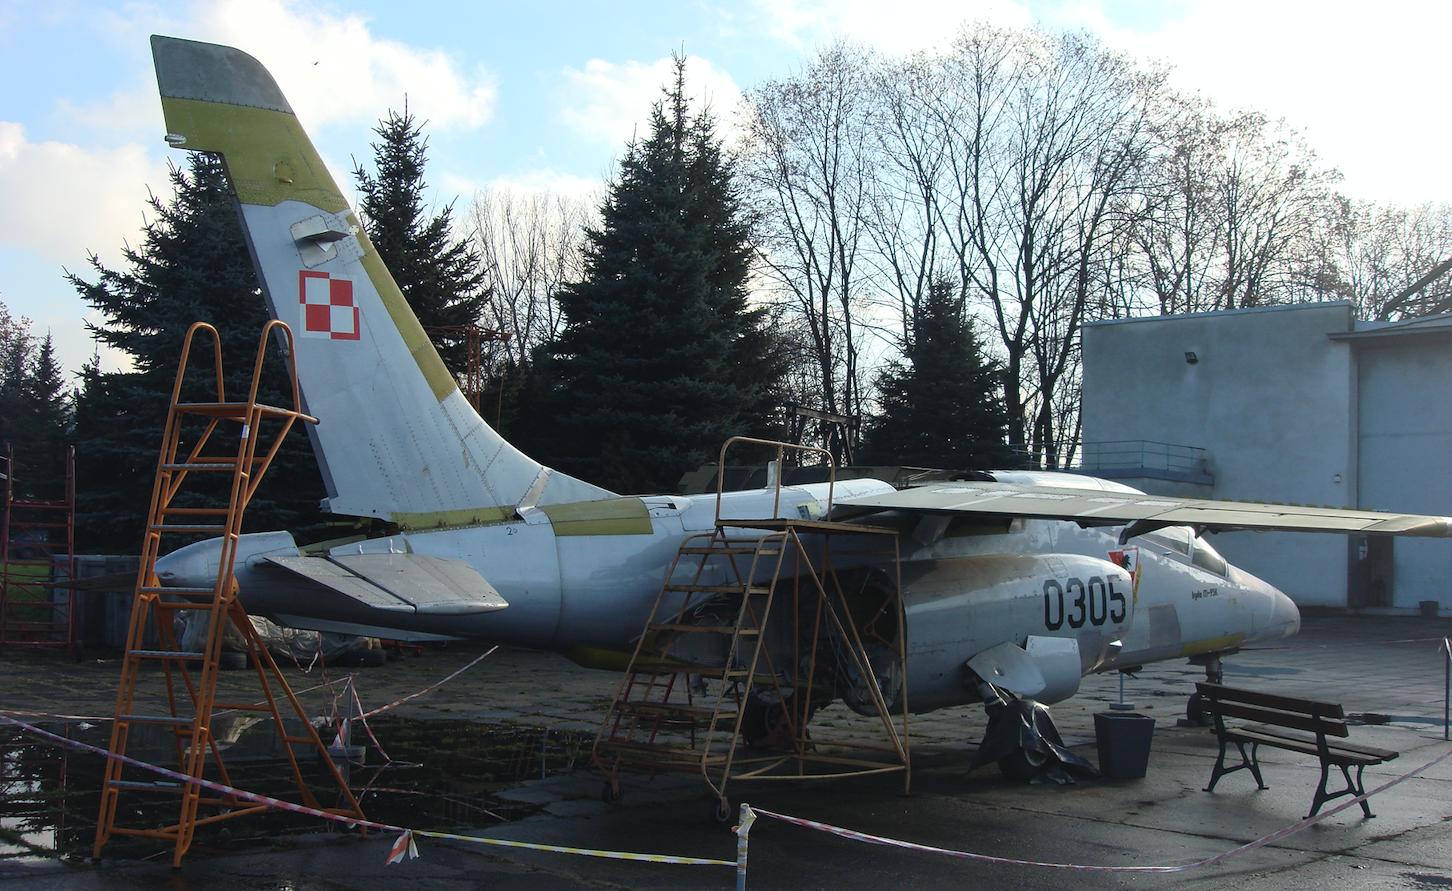 PZL I-22 Iryda nb 0305. Kraków 2009 rok. Zdjęcie Karol Placha Hetman